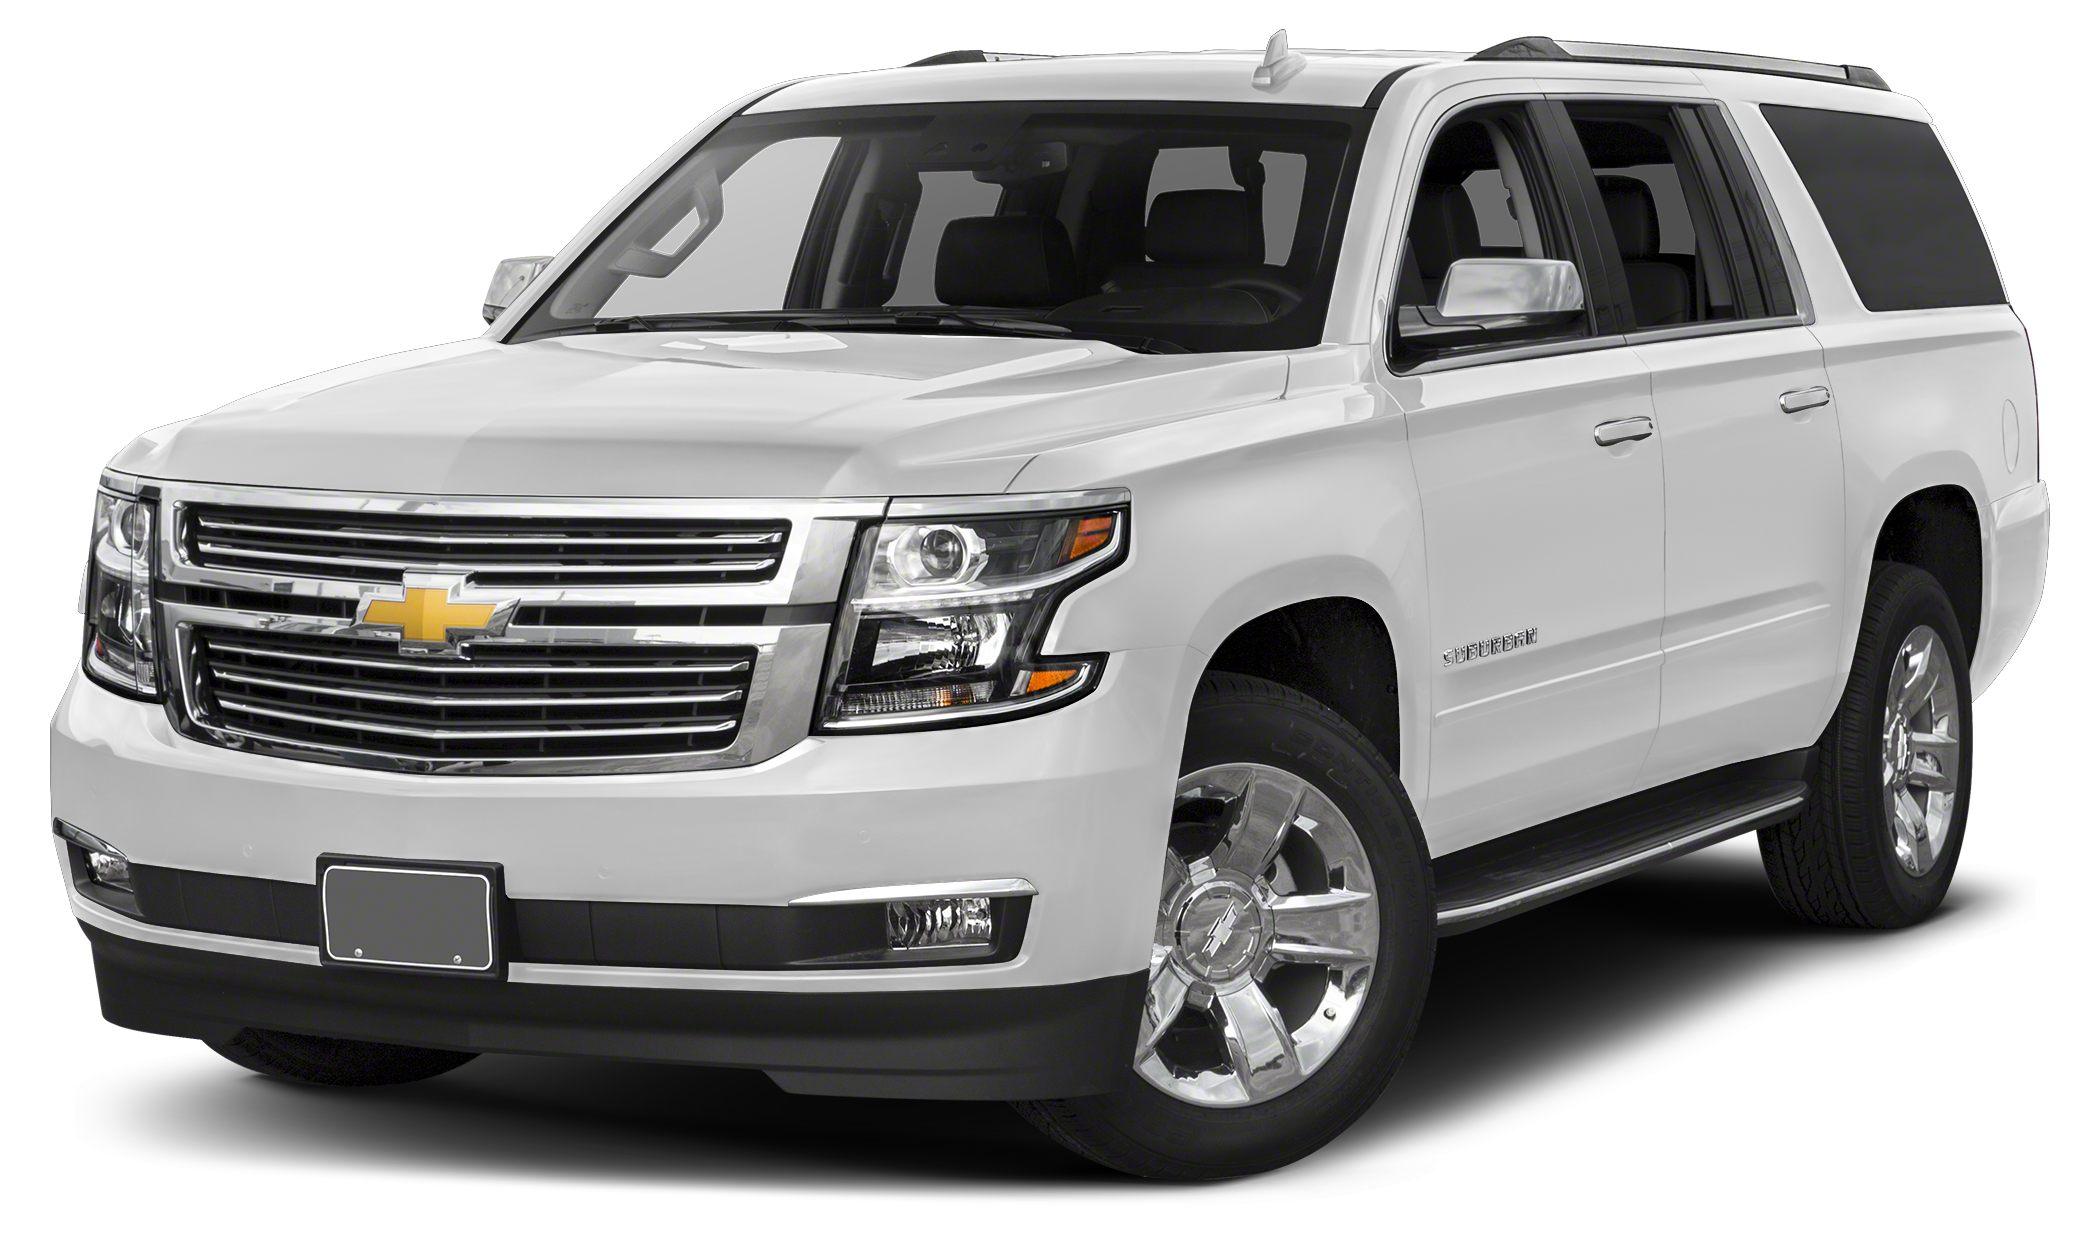 2016 Chevrolet Suburban LTZ Miles 0Color Summit White Stock 167274 VIN 1GNSCJKC8GR402388